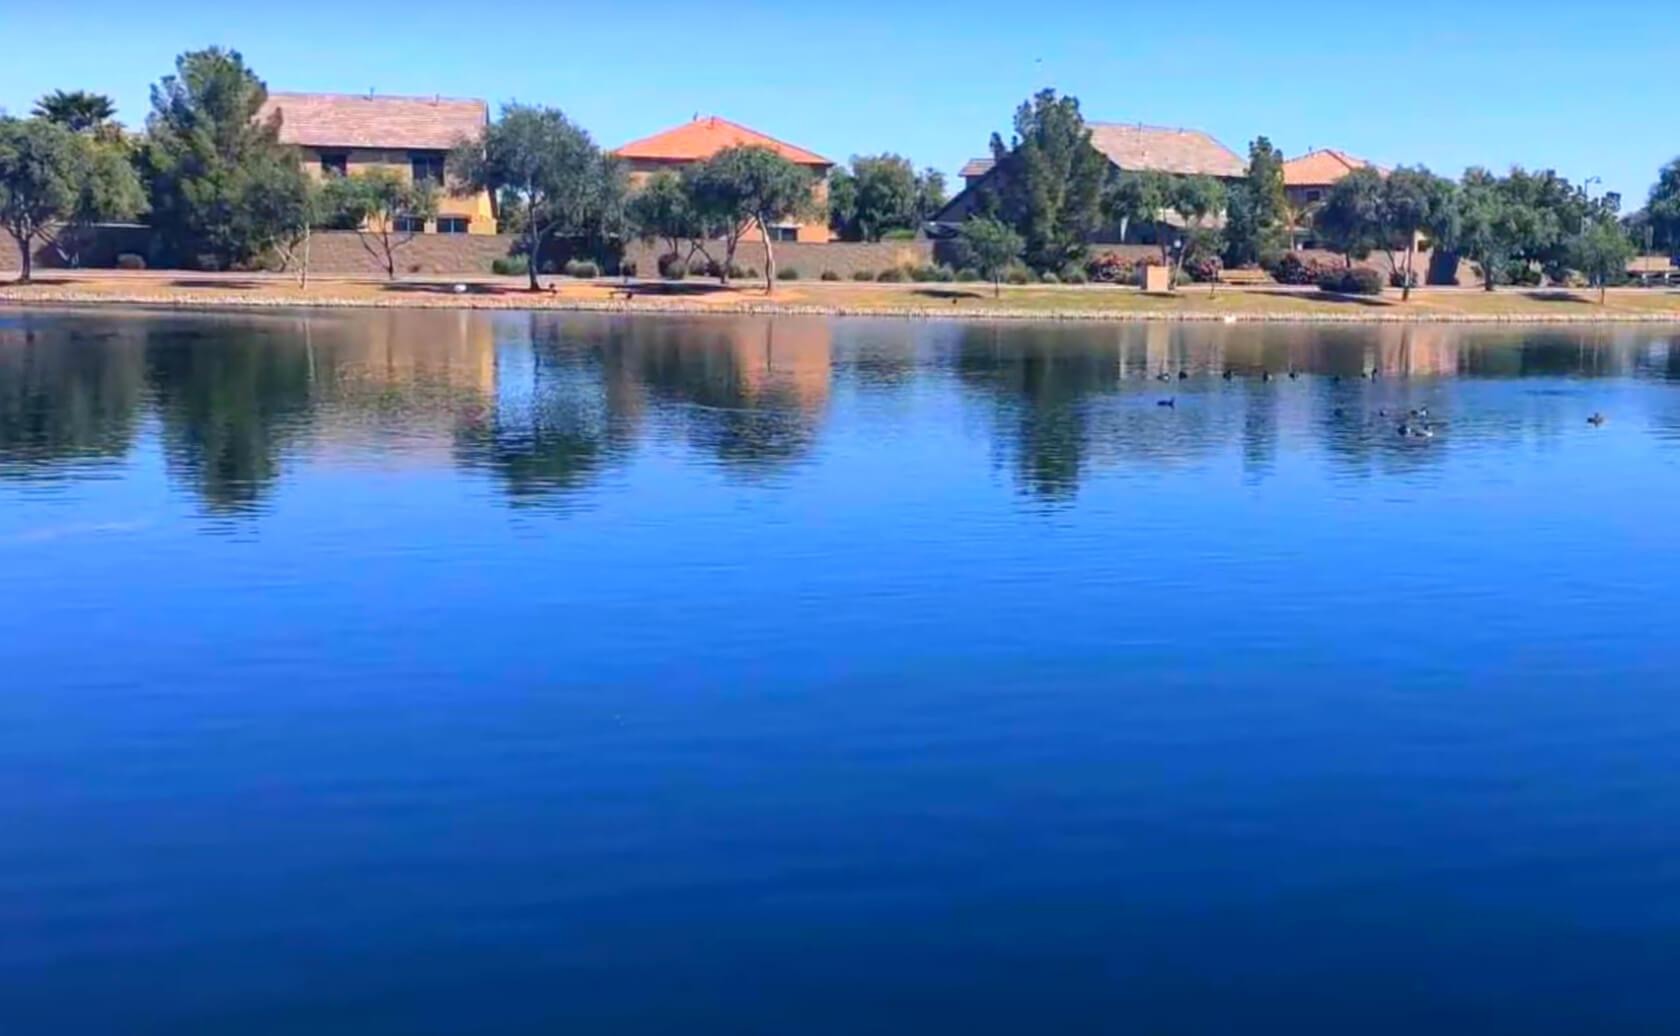 Pacana-Park-Lake-Fishing-Guide-Report-Maricopa-AZ-03